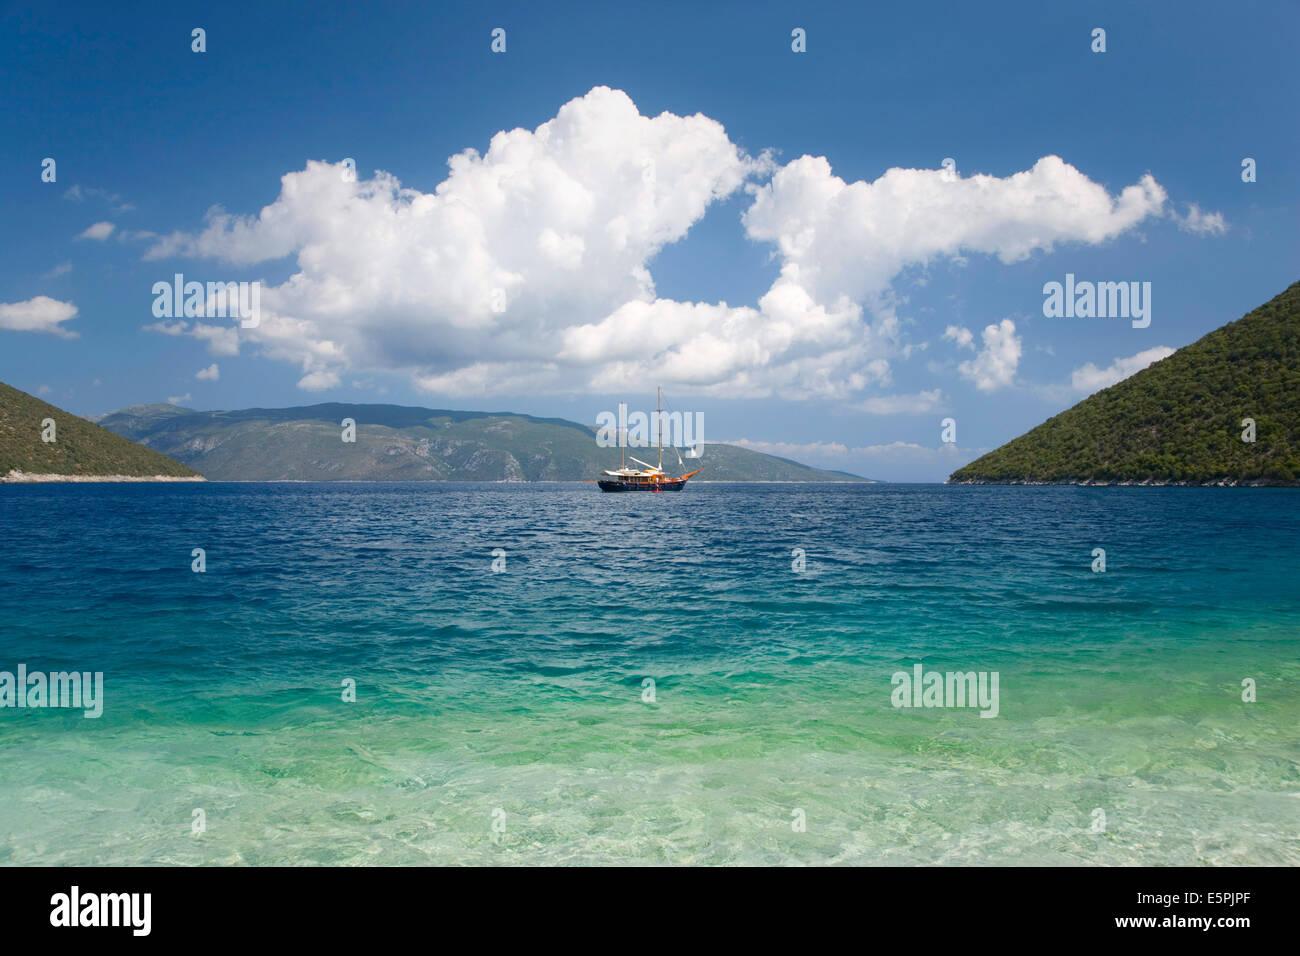 View across Antisamos Bay, Sami, Kefalonia (Kefallonia, Cephalonia), Ionian Islands, Greek Islands, Greece, Europe - Stock Image